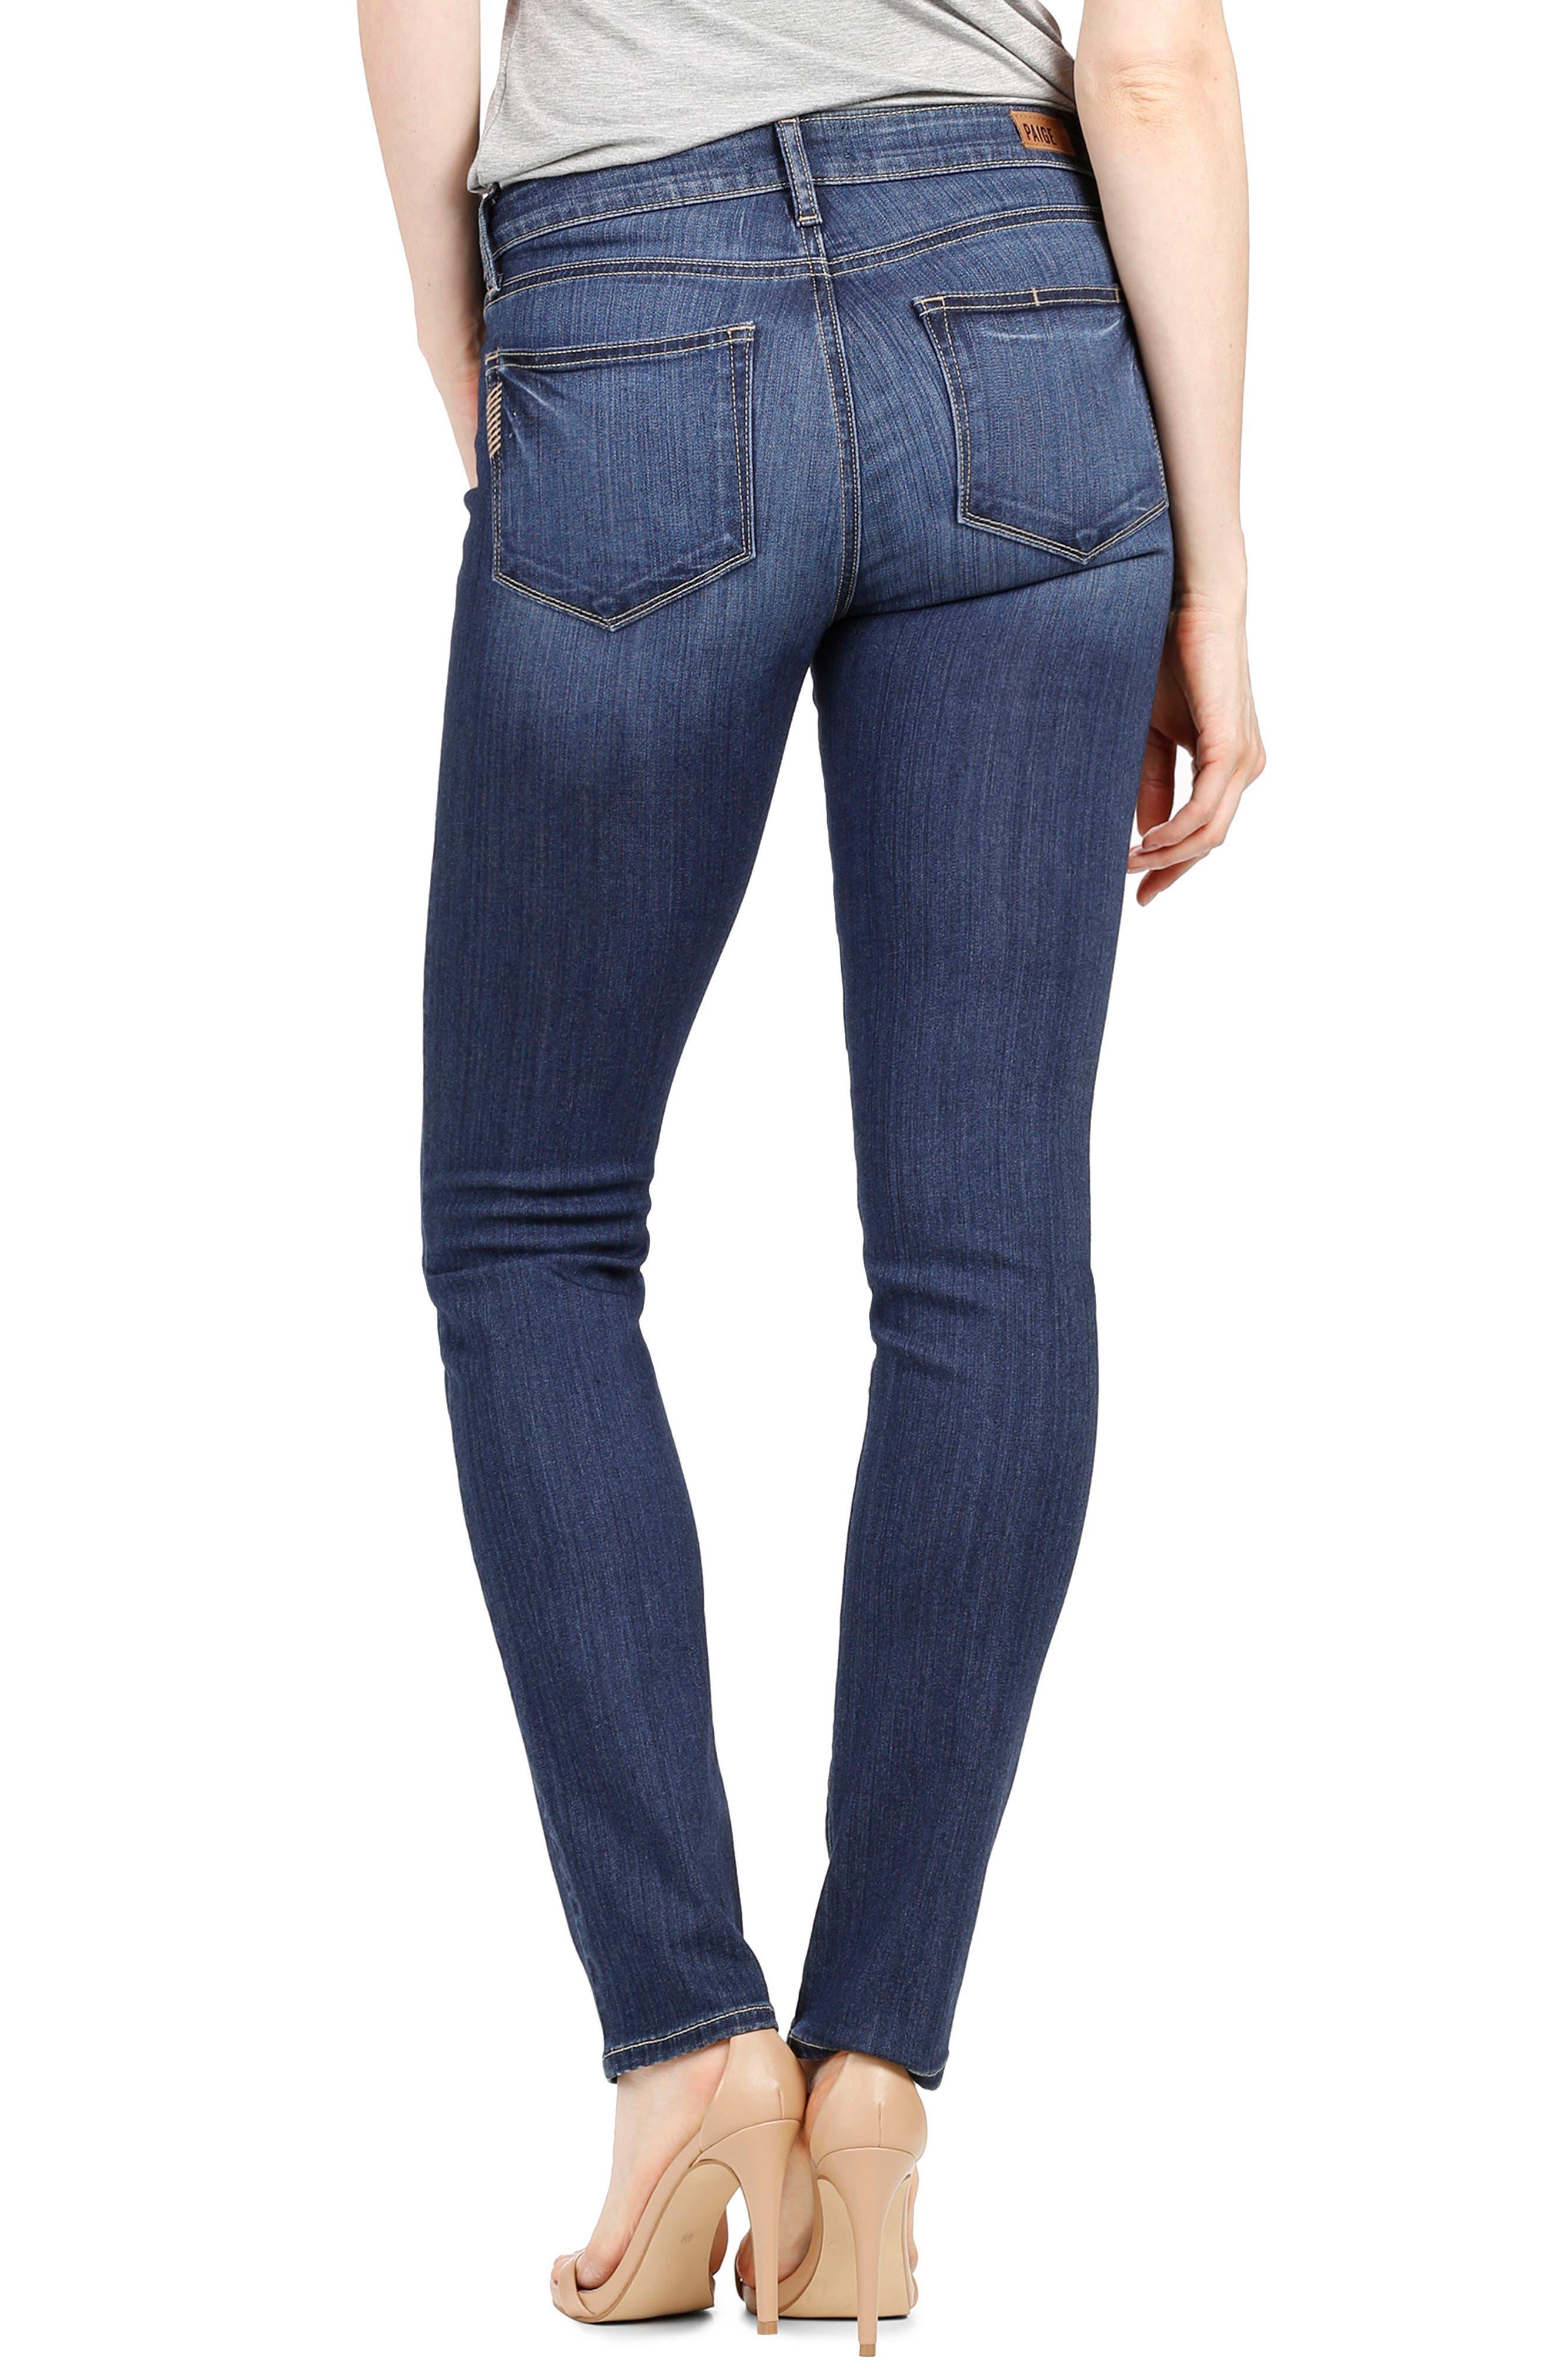 Transcend - Skyline Skinny Jeans,                             Alternate thumbnail 3, color,                             Blue